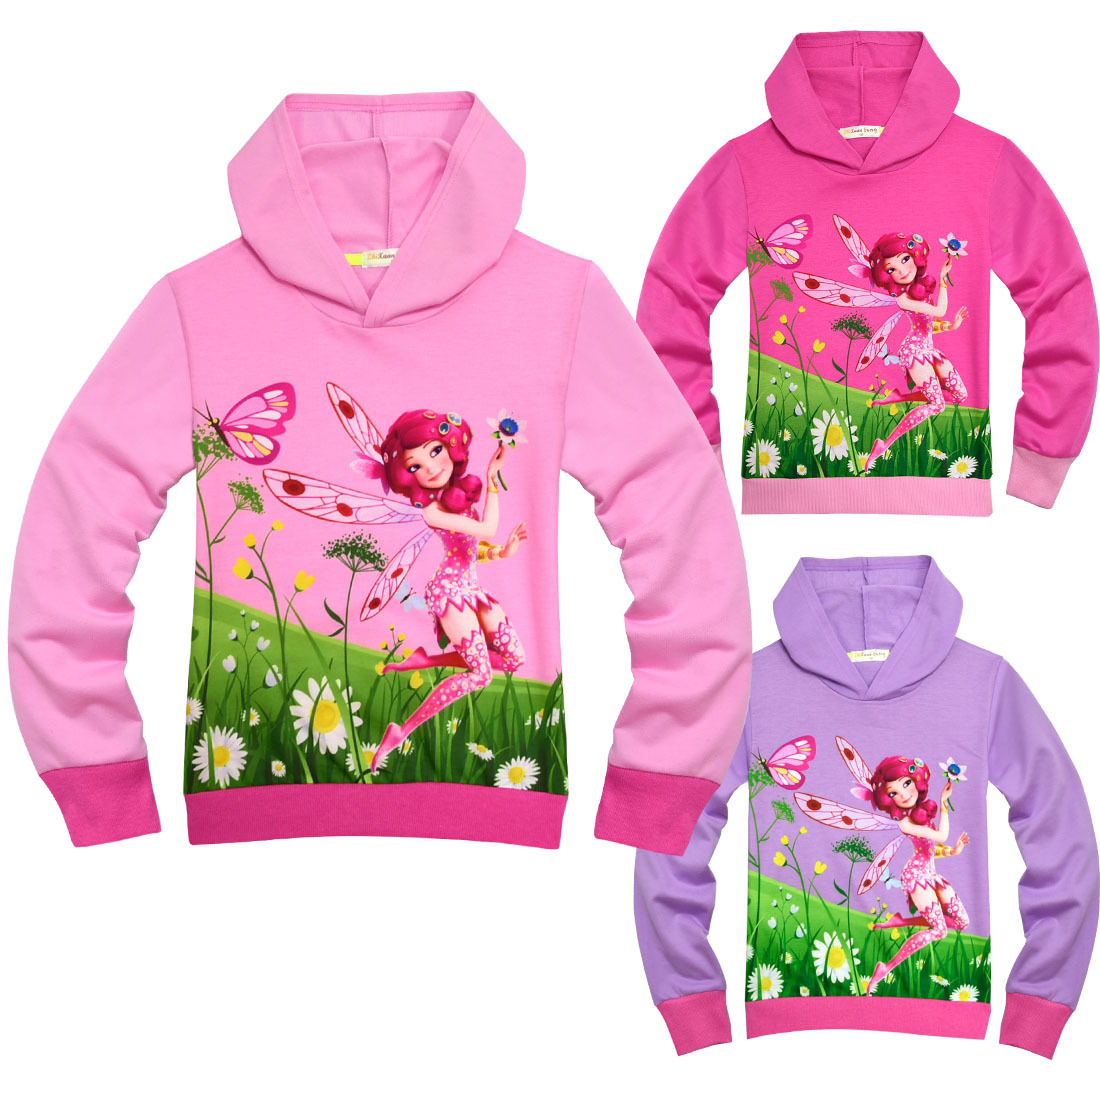 Kids Girls Halloween Costume YoKu Mia and Me Cosplay Hoodie Top Sweatshirt Anime Cartoon Comics Children Cosplay Disfraces